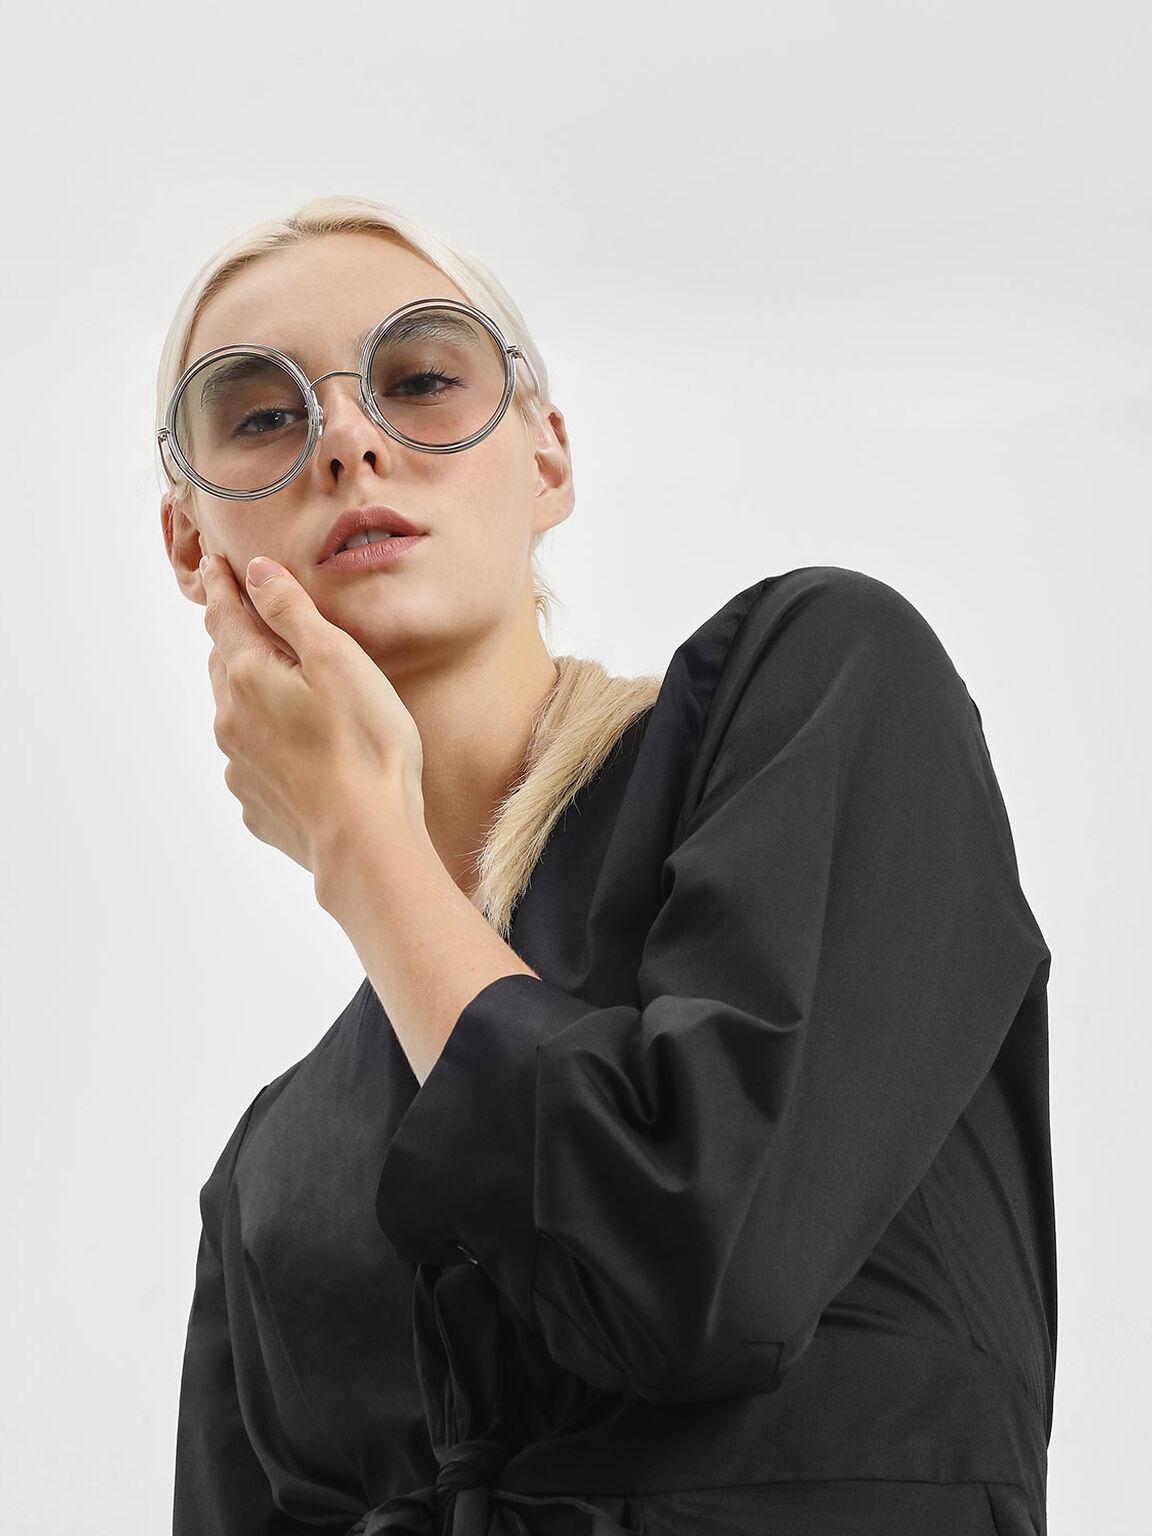 Cutout Frame Round Sunglasses, Silver, hi-res